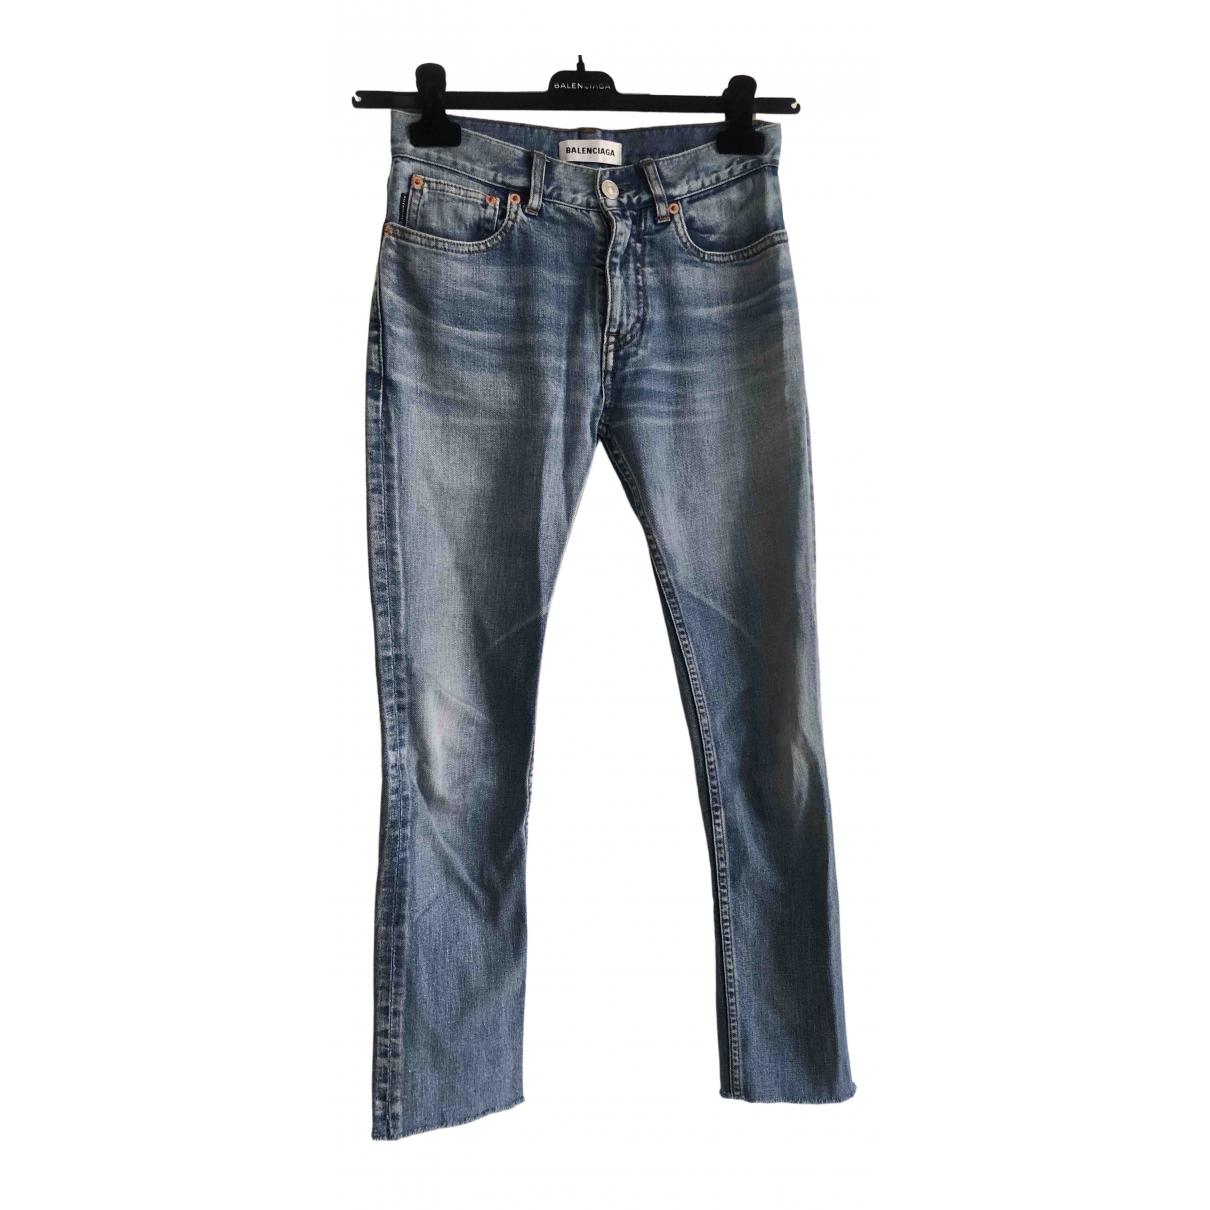 Balenciaga - Pantalon   pour femme en denim - bleu